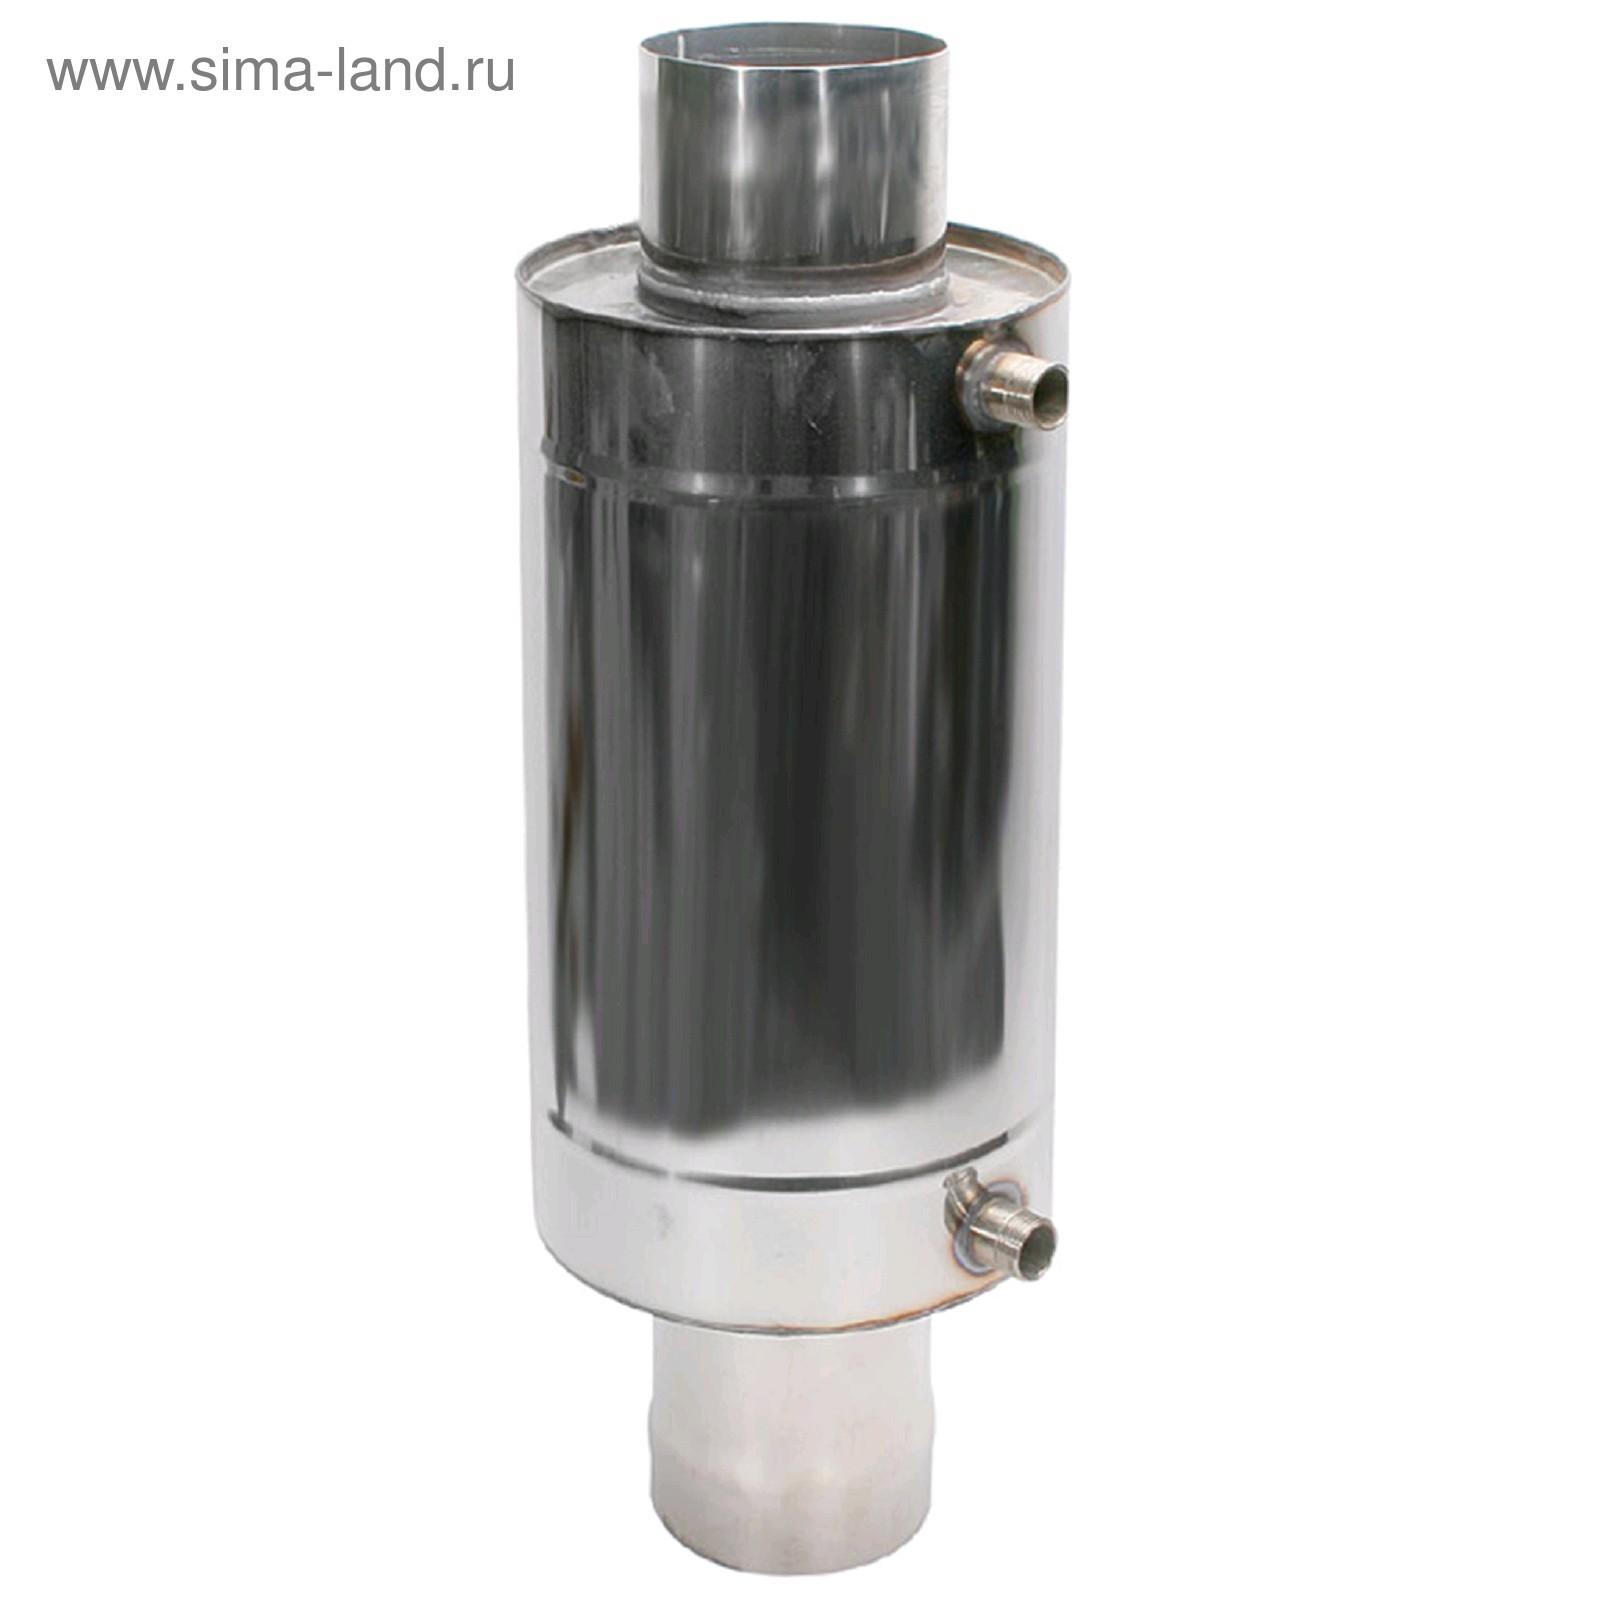 Теплообменник феррум комфорт самоварного типа 7л отзывы Кожухотрубный конденсатор Alfa Laval CPS 100 Сарапул